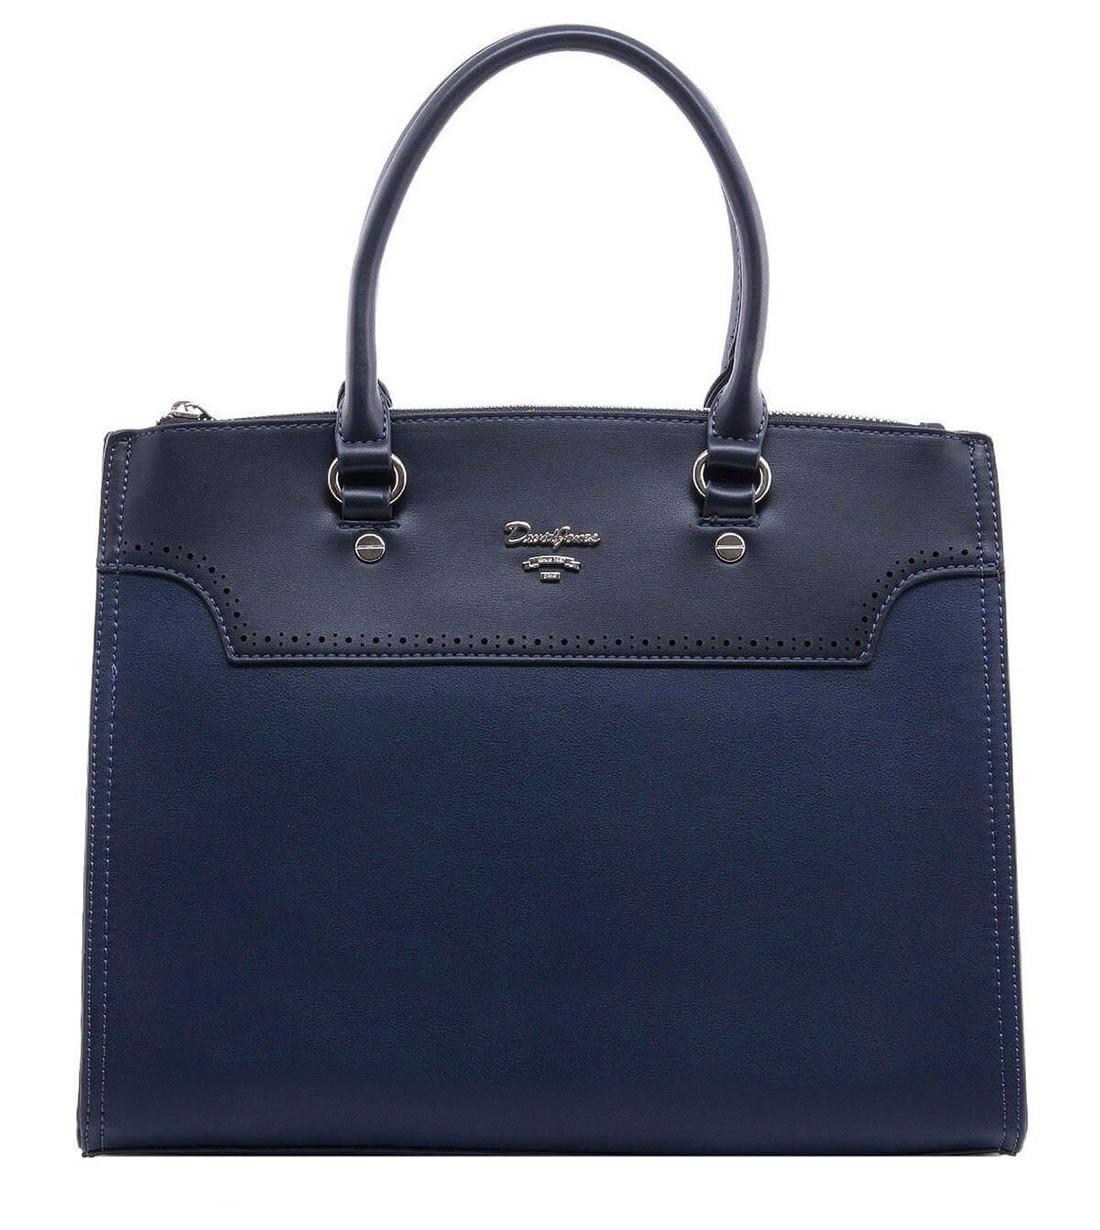 Женска сумка David Jones 28 x 32 x 10 см Синий (djcm5030/2)